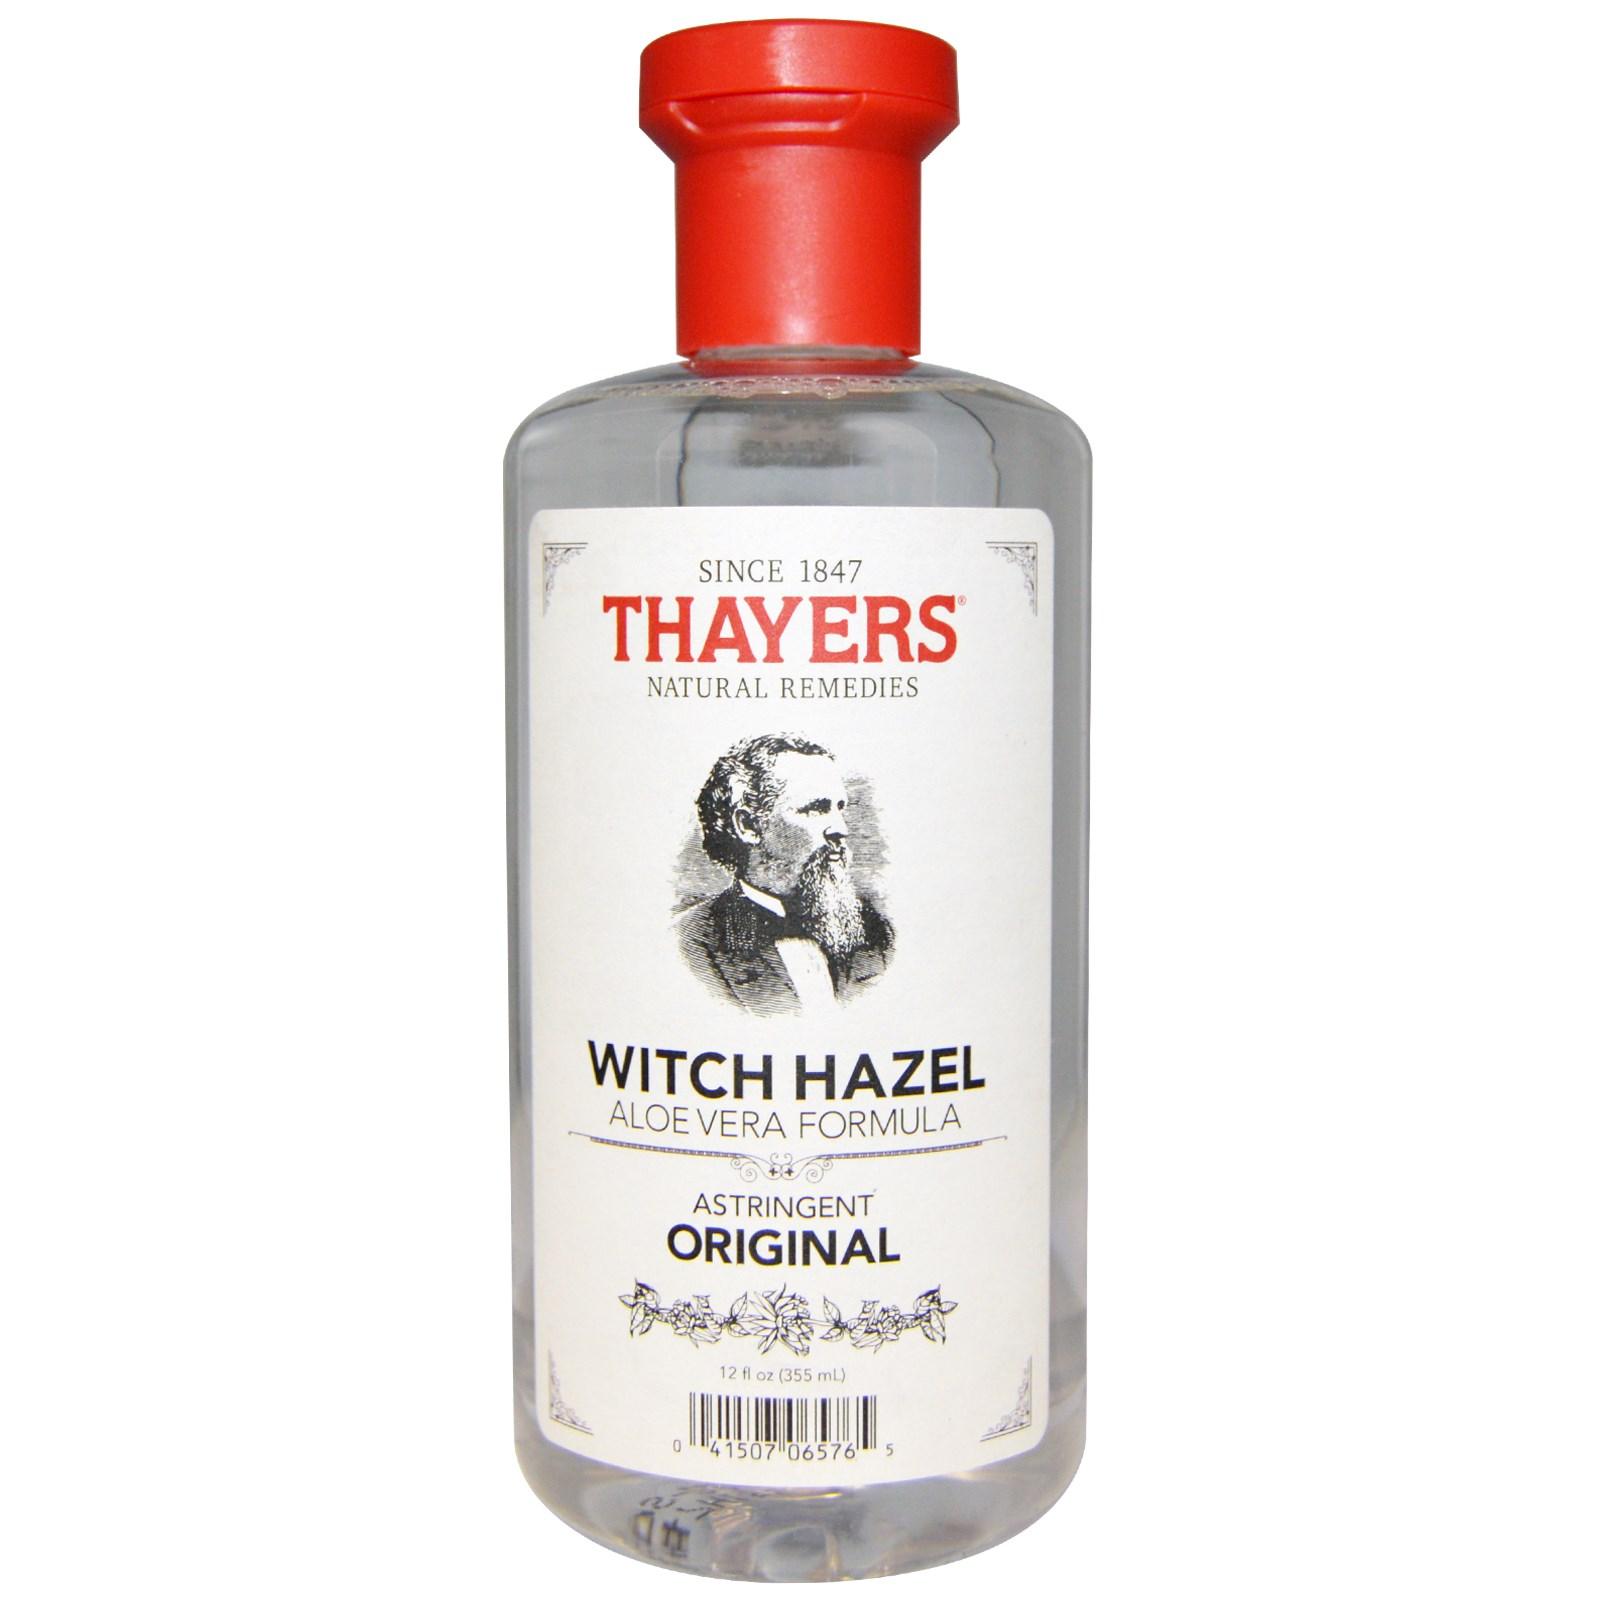 NƯỚC HOA HỒNG THAYERS WITCH HAZEL ORIGINAL